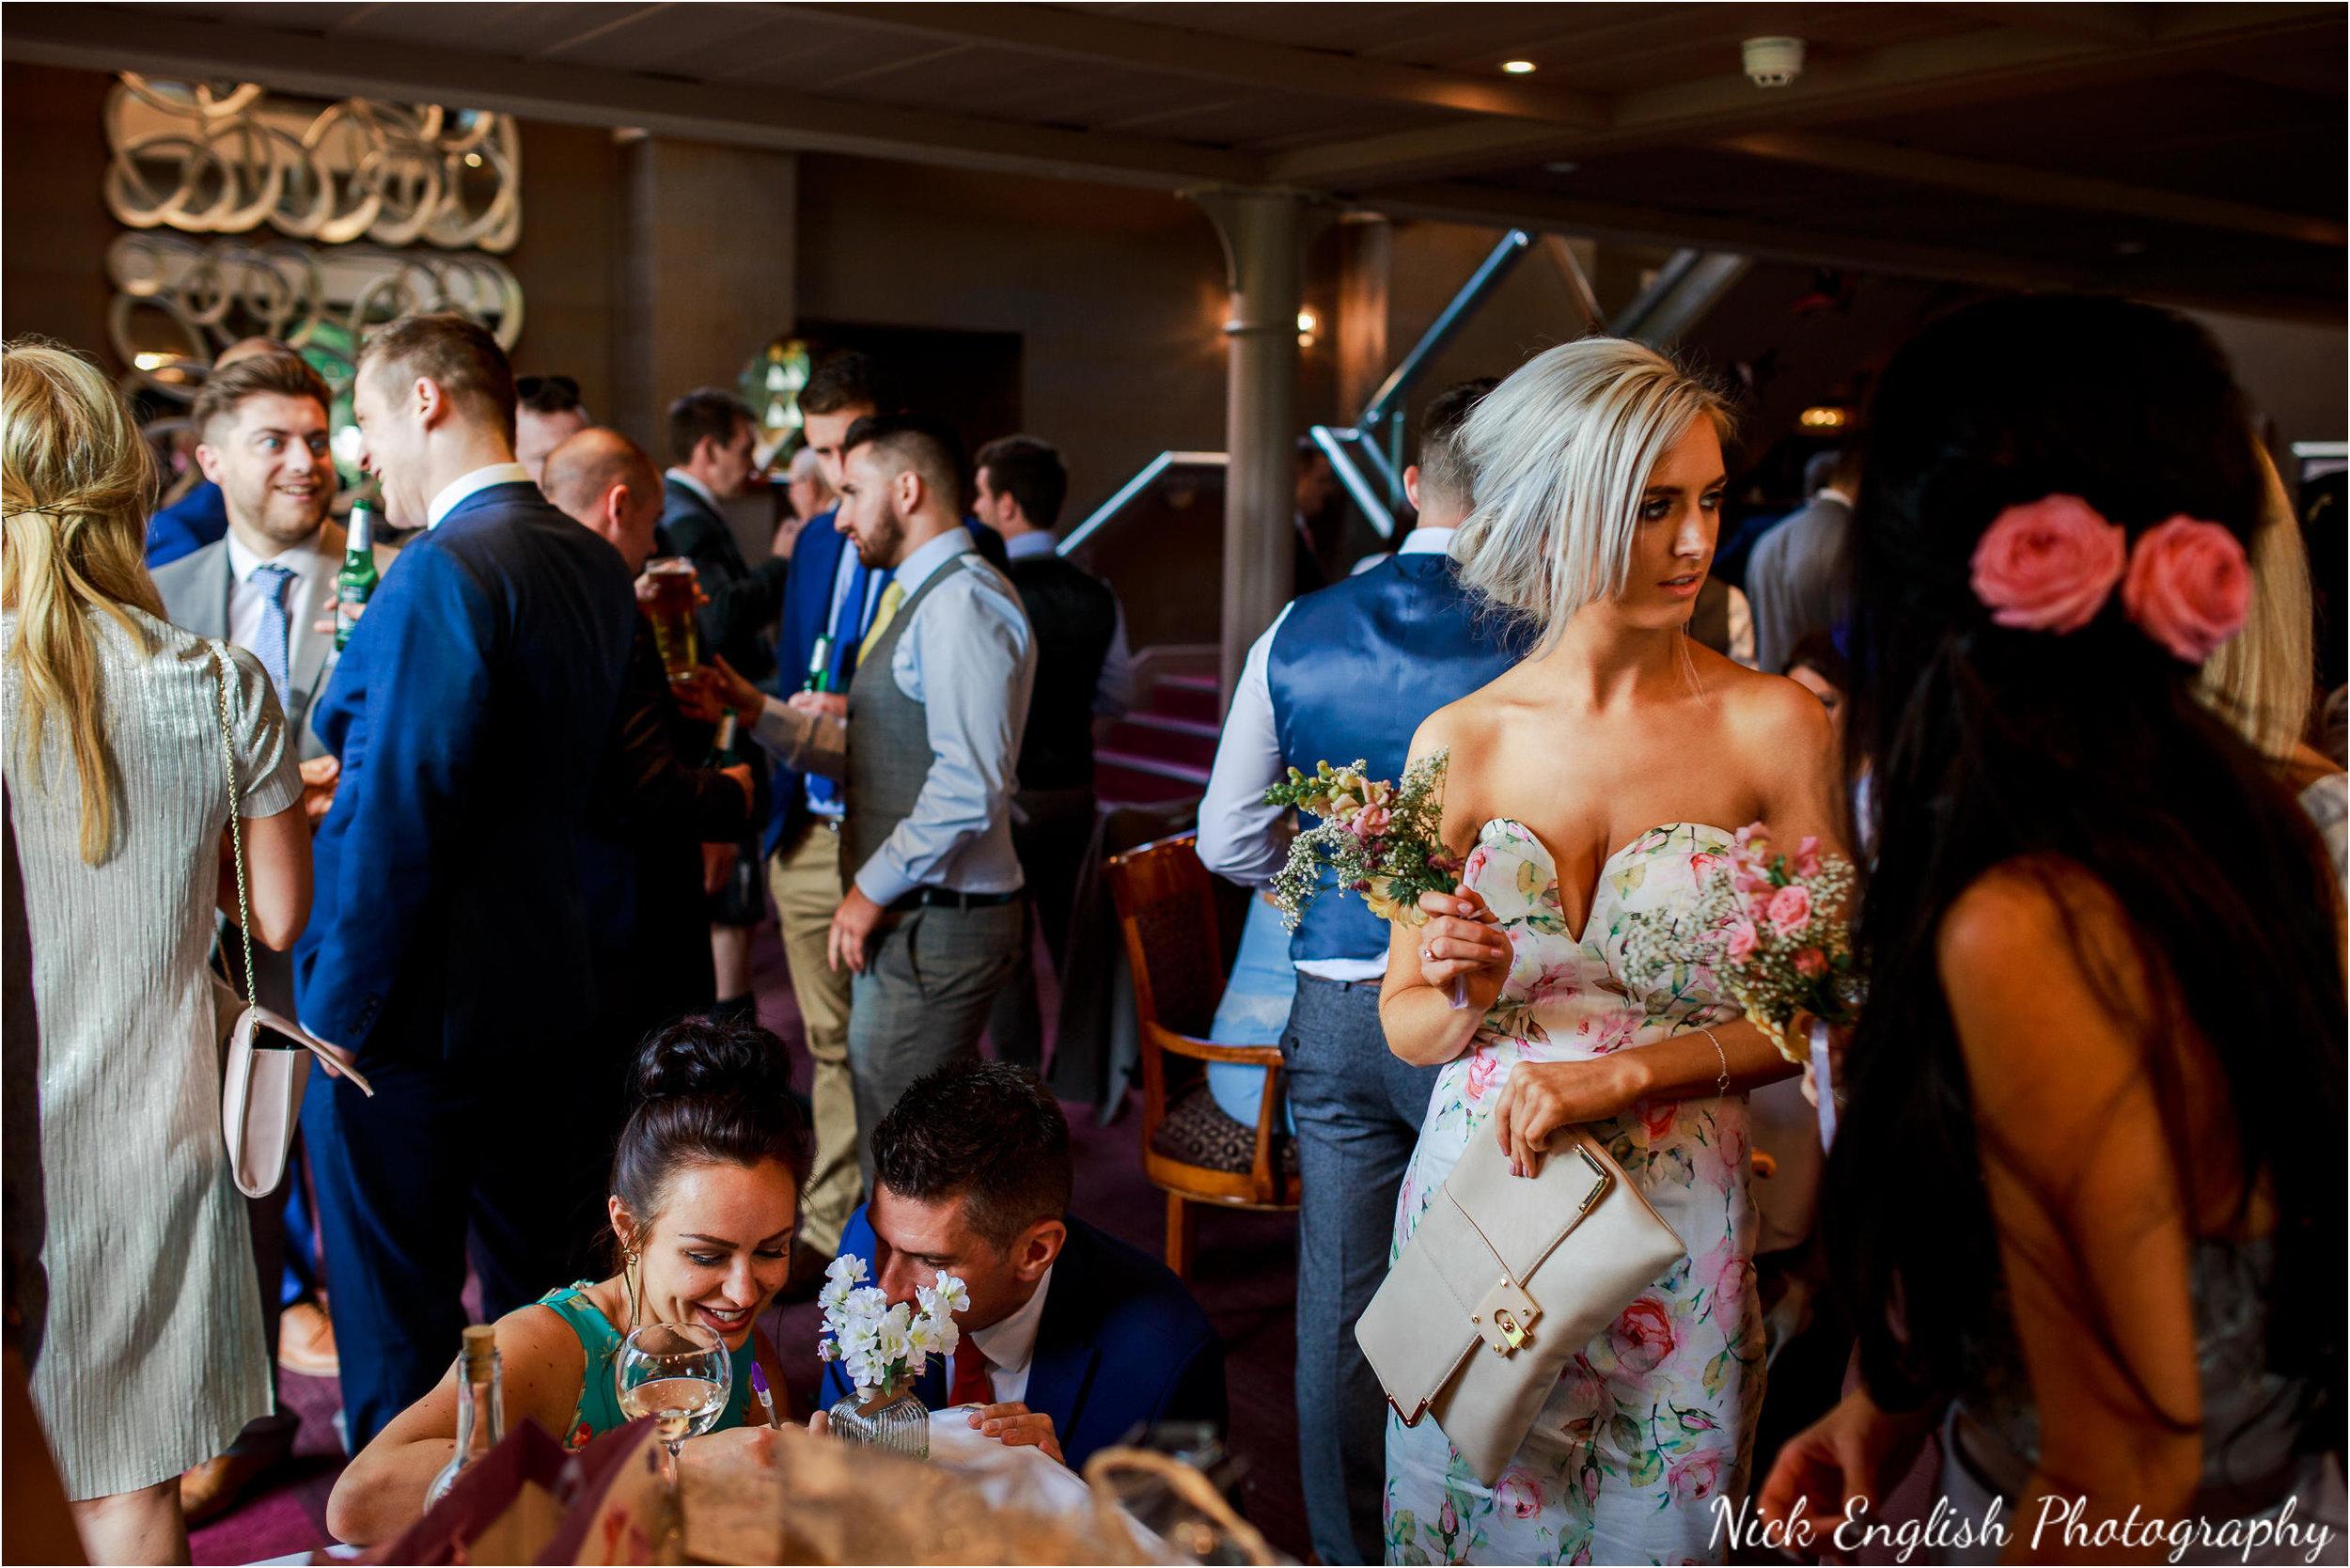 Stacey-Ash-Wedding-Photographs-Stanley-House-Preston-Lancashire-133.jpg